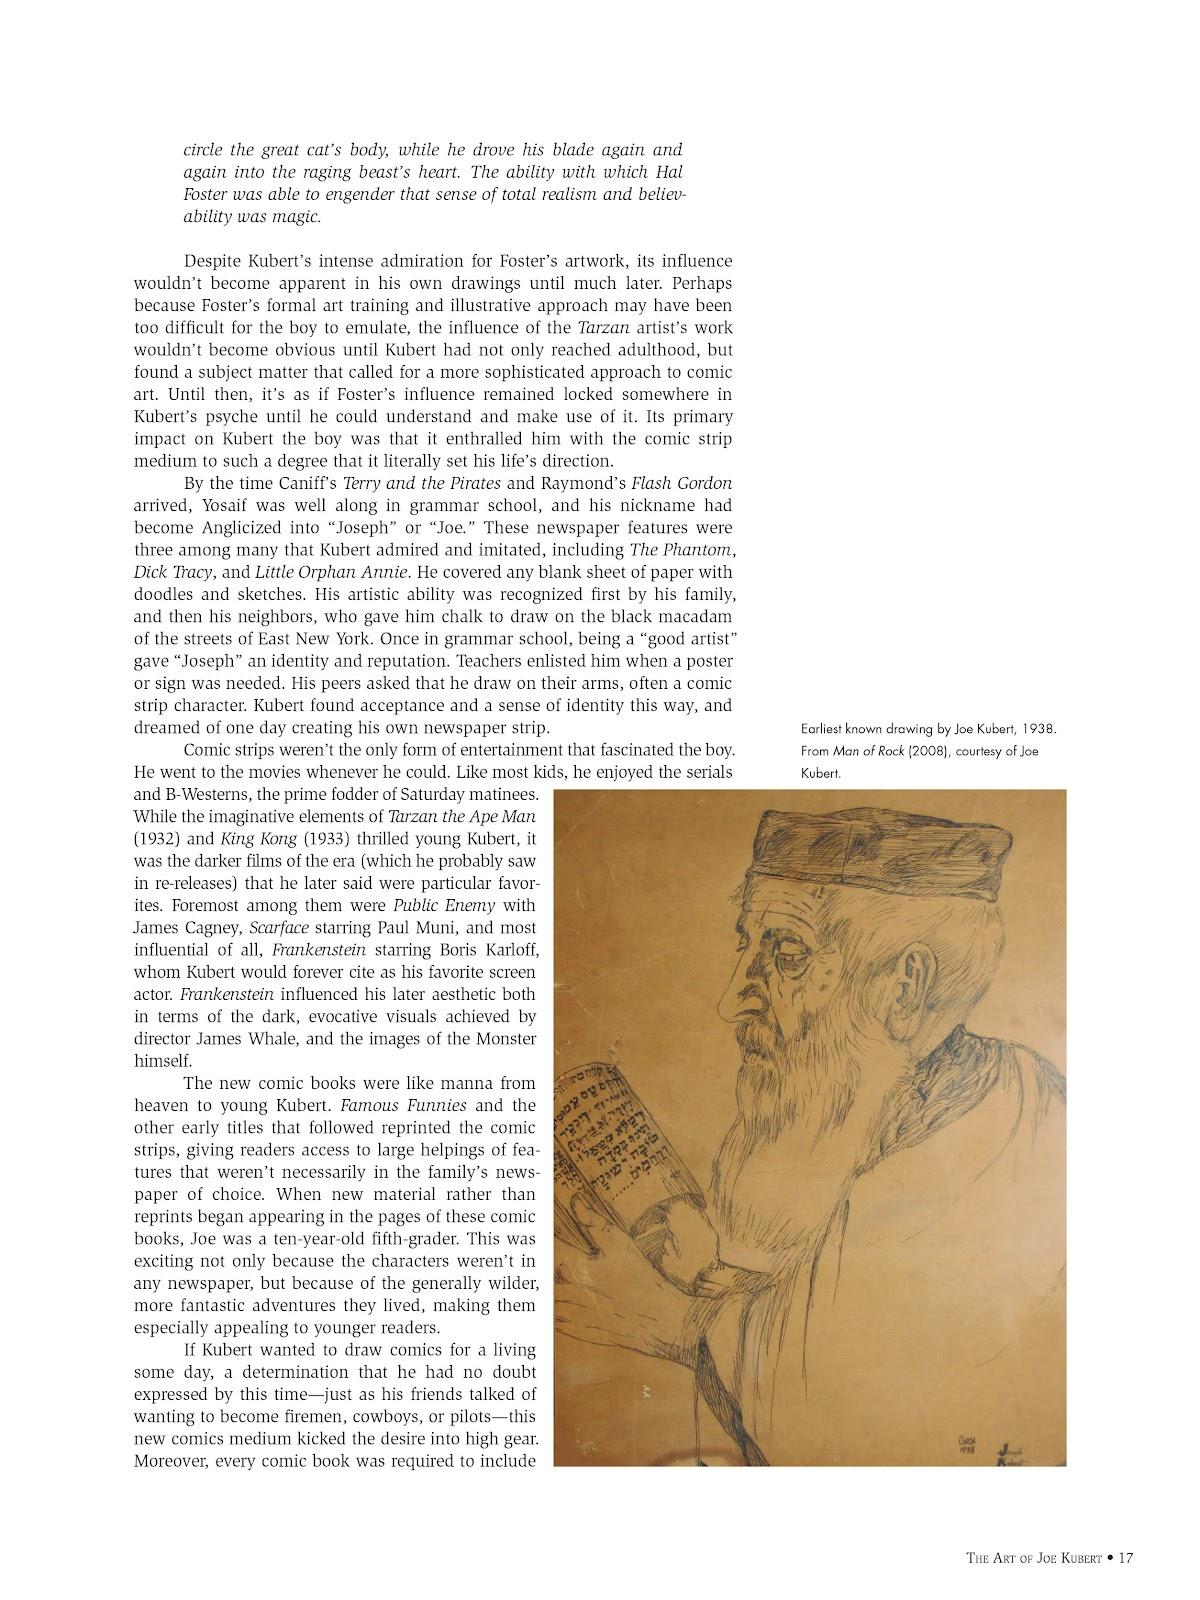 Read online The Art of Joe Kubert comic -  Issue # TPB (Part 1) - 17